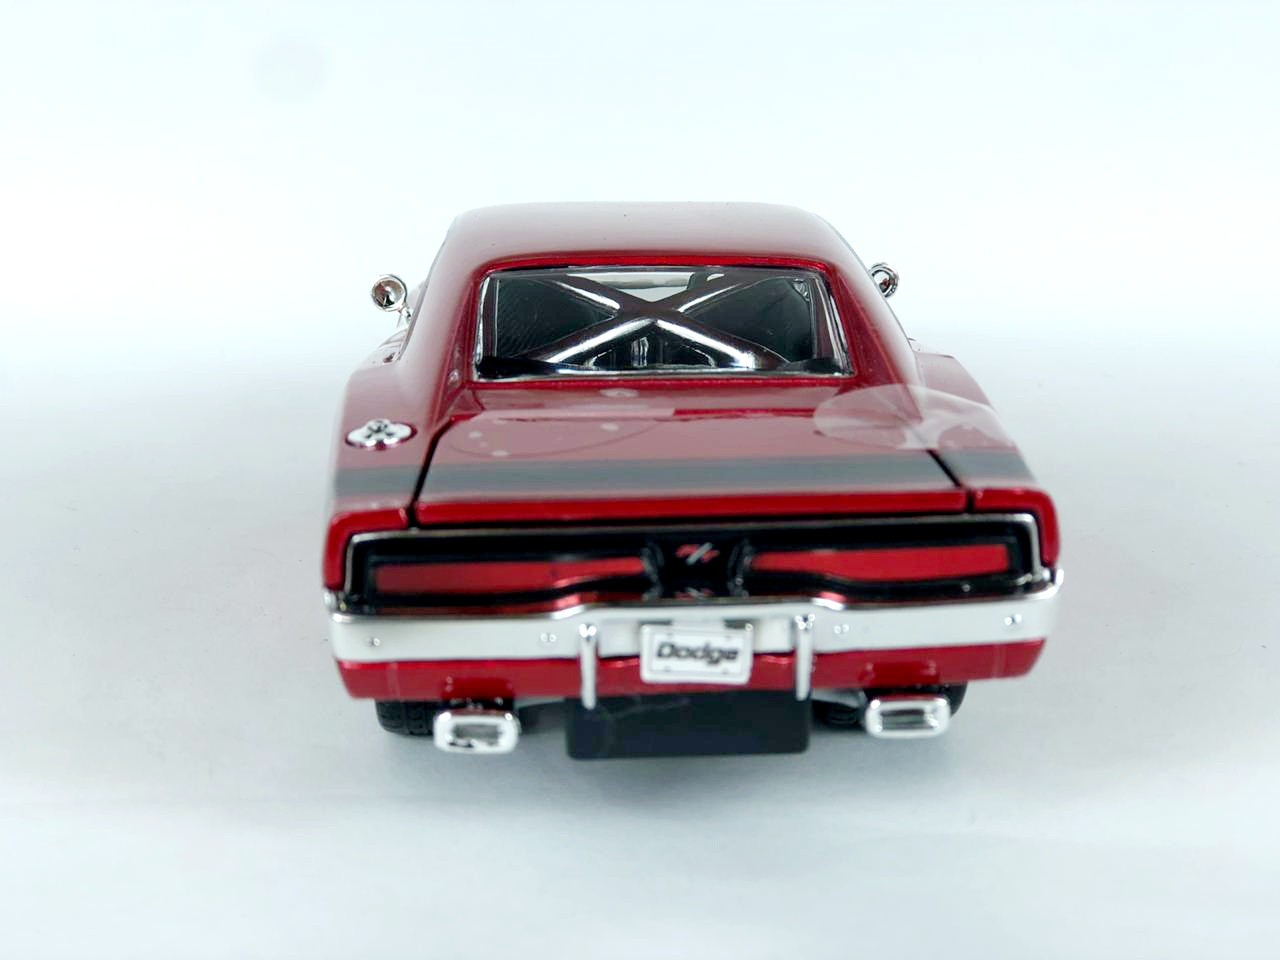 Miniatura Dodge Charger R/T 1969 1/24 Maisto